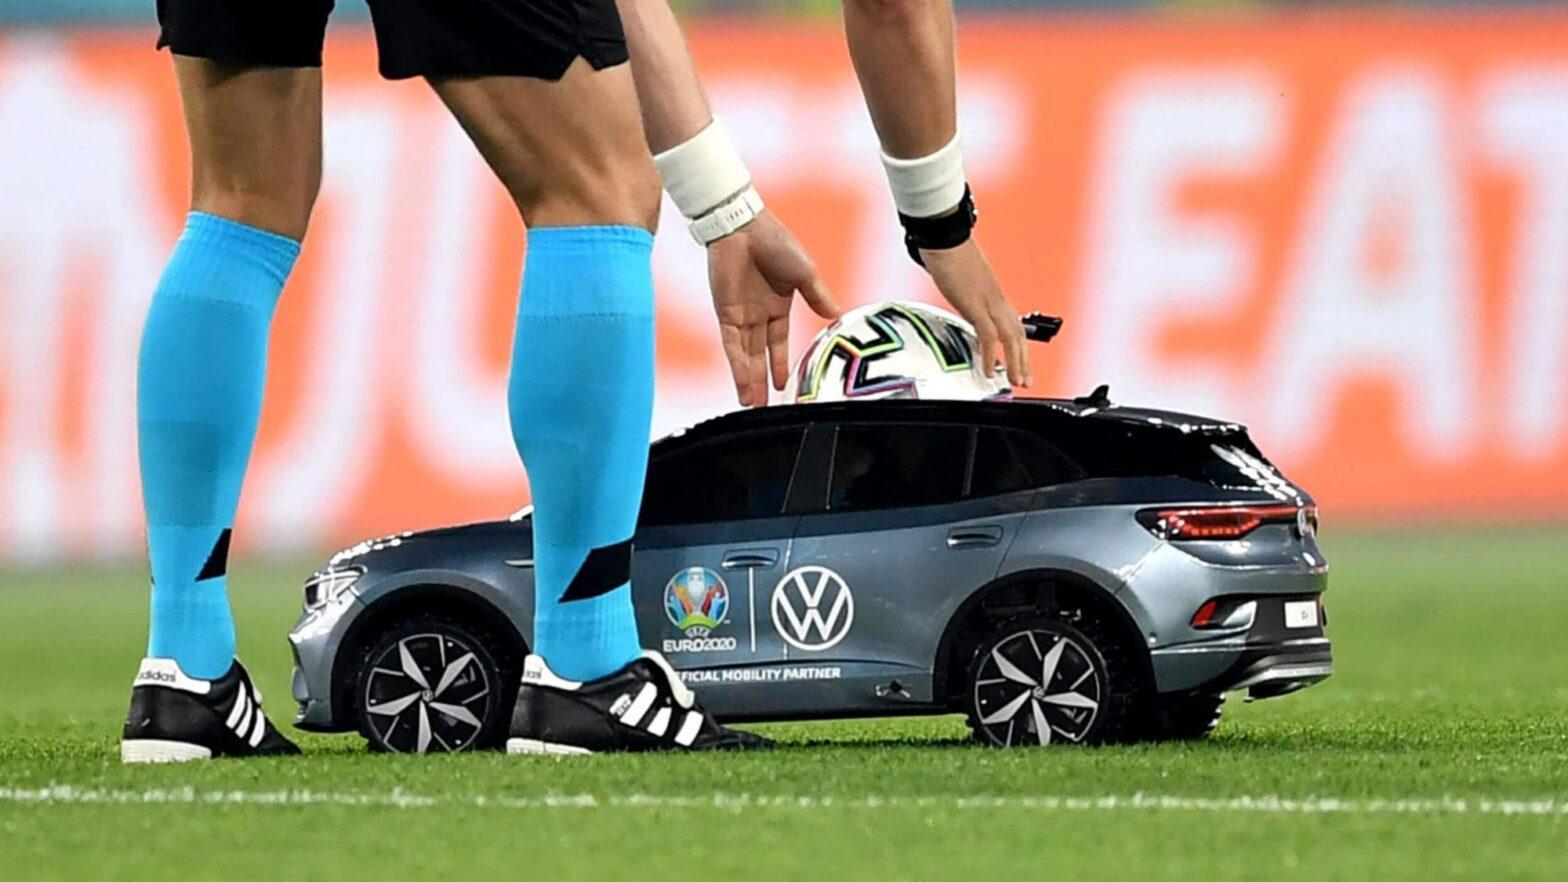 Volkswagen Remote Controlled ID.4 UEFA Euro 2020